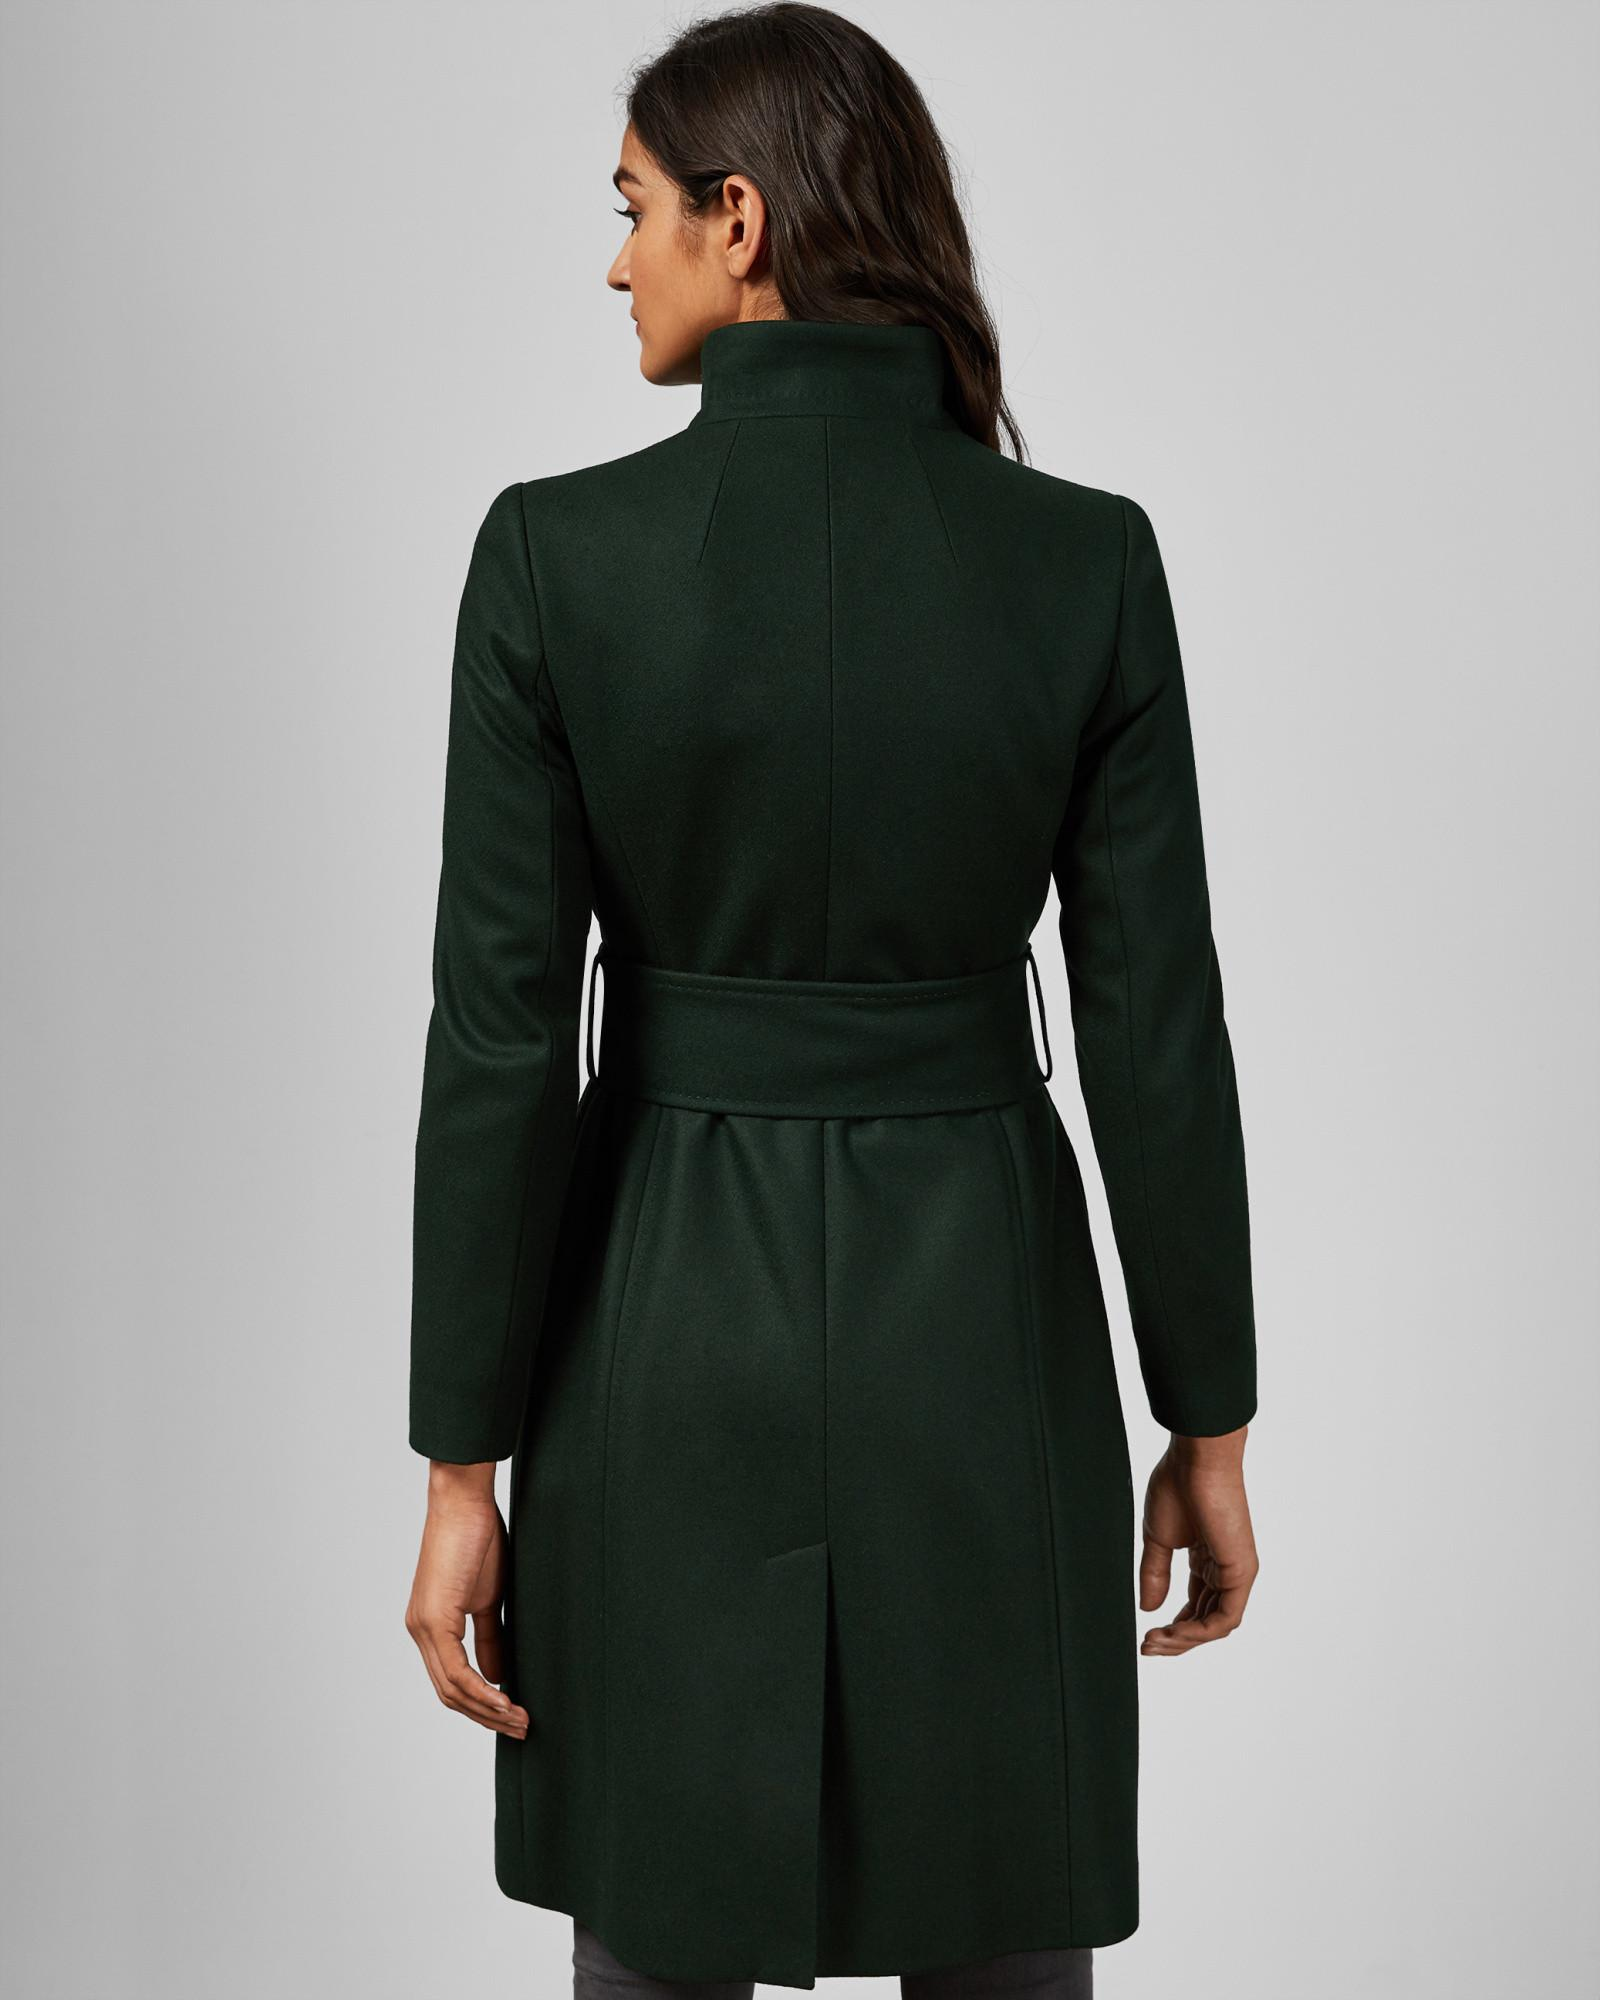 6889a11ea ... Green Belted High Neck Wool Coat - Lyst. View fullscreen